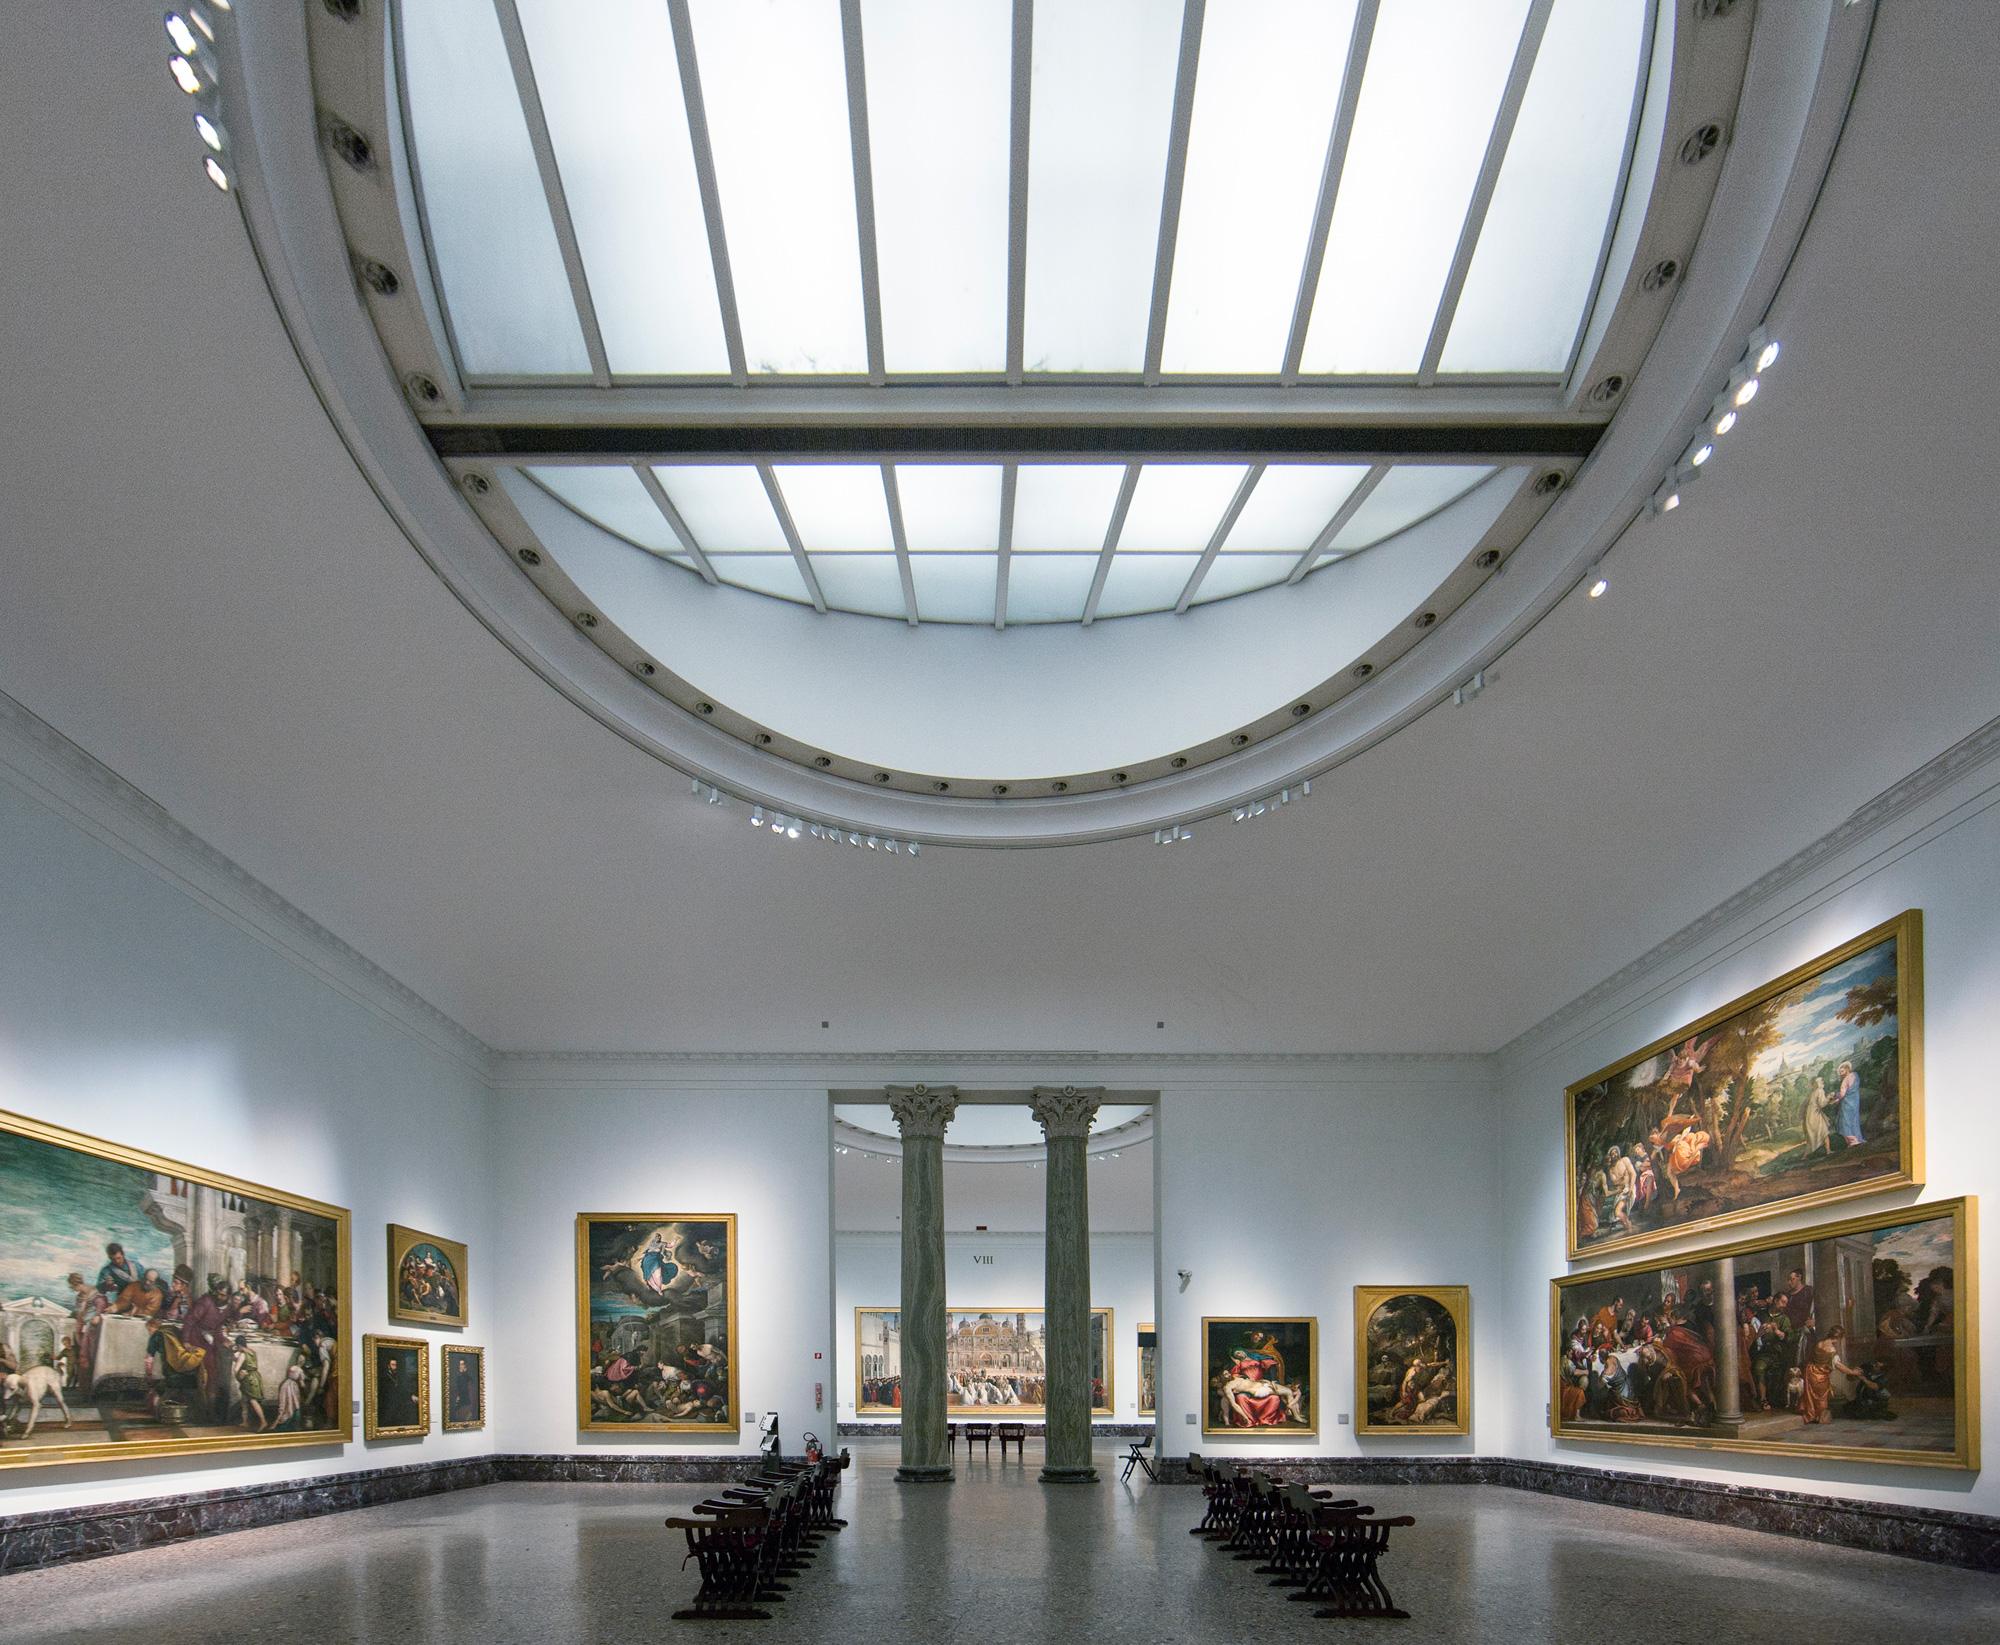 Reale, Virtuale, Luce e Musei Interattivi